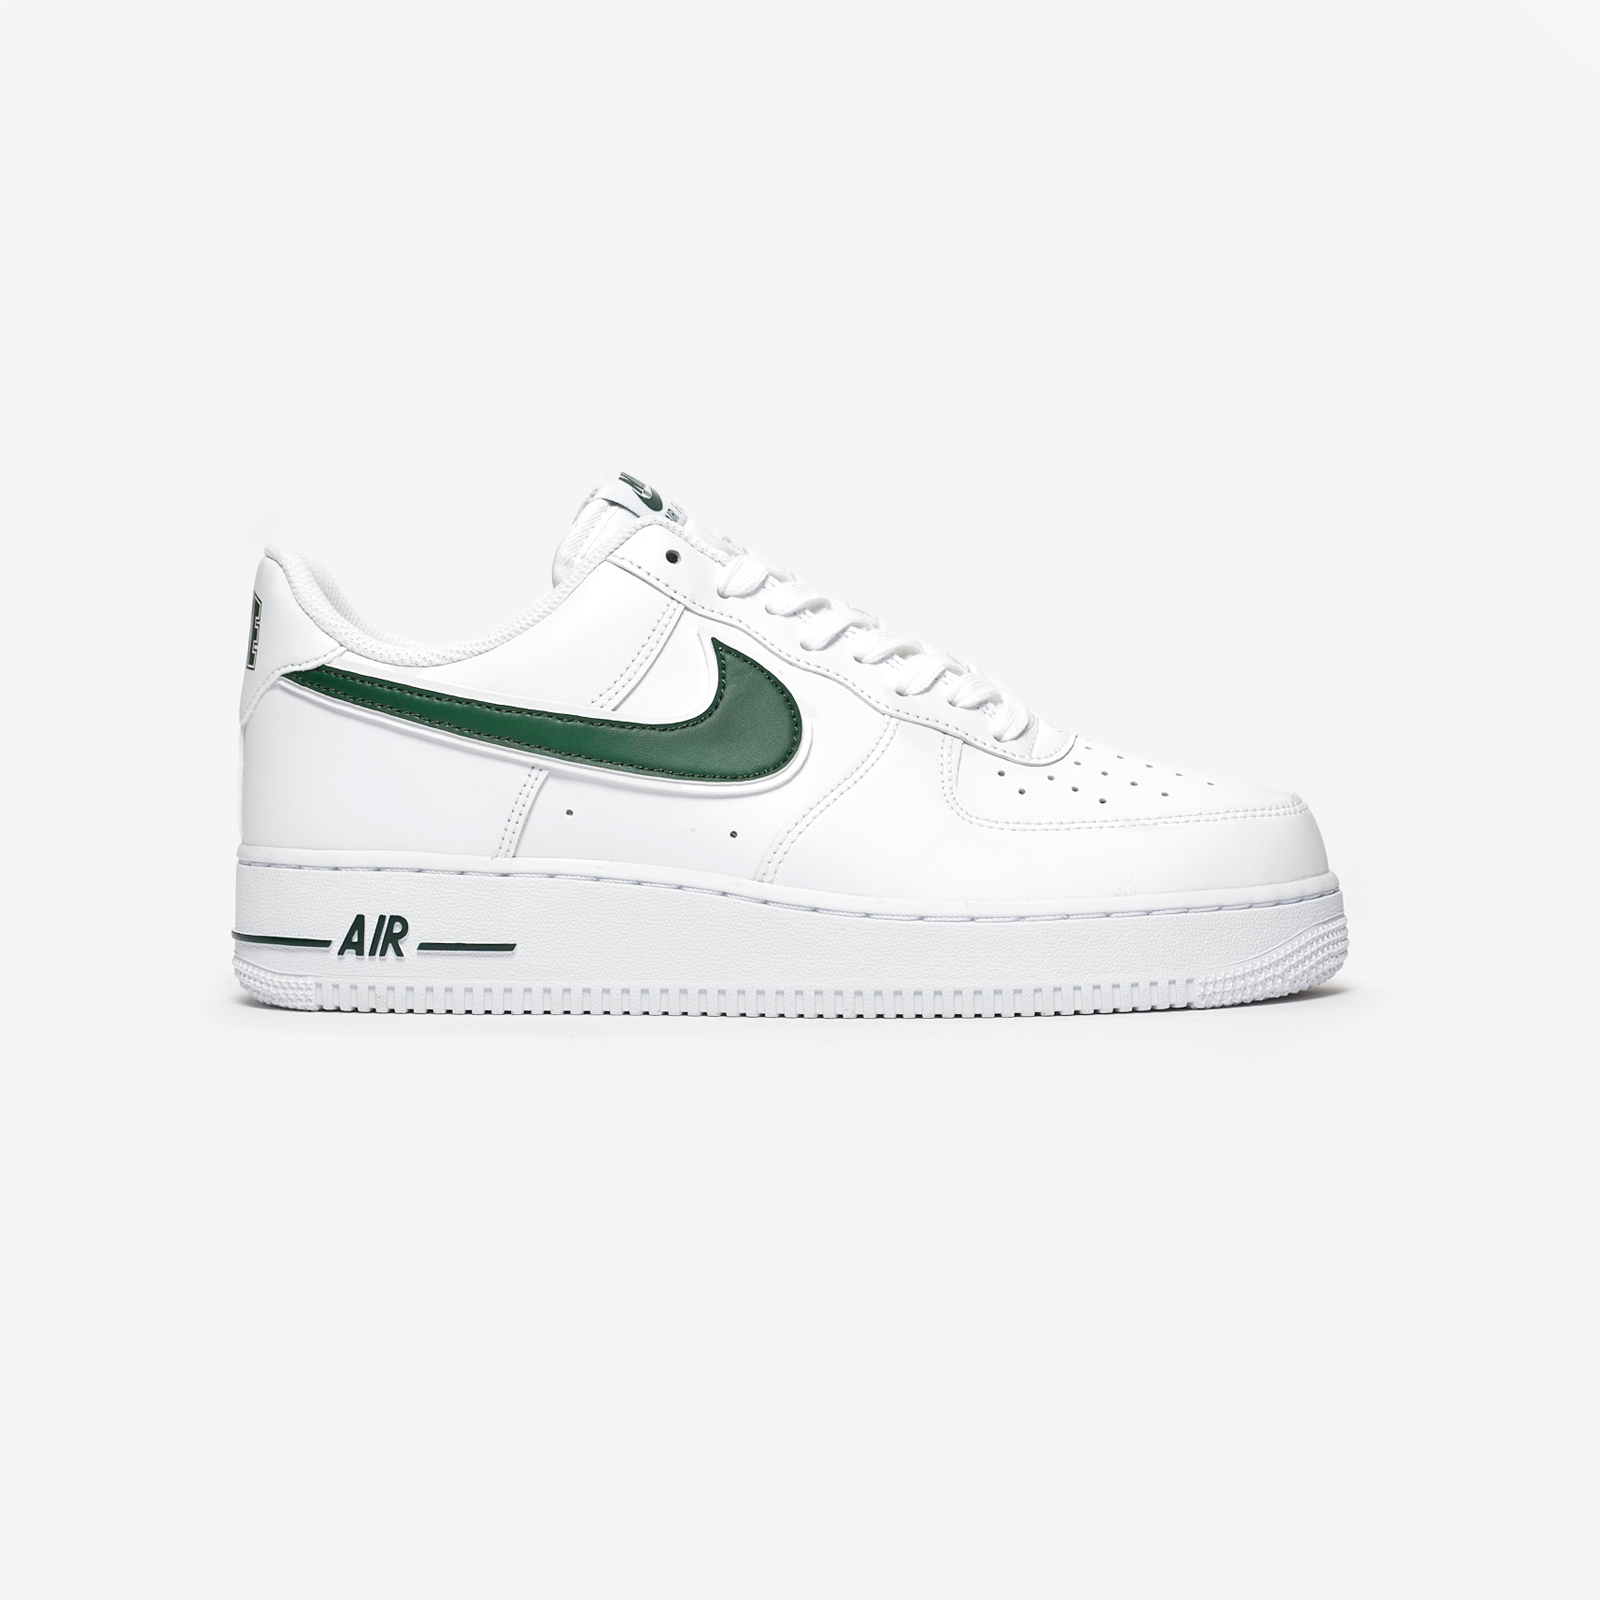 Kicks Deals - Official Website Nike Air Force 1 Low '07